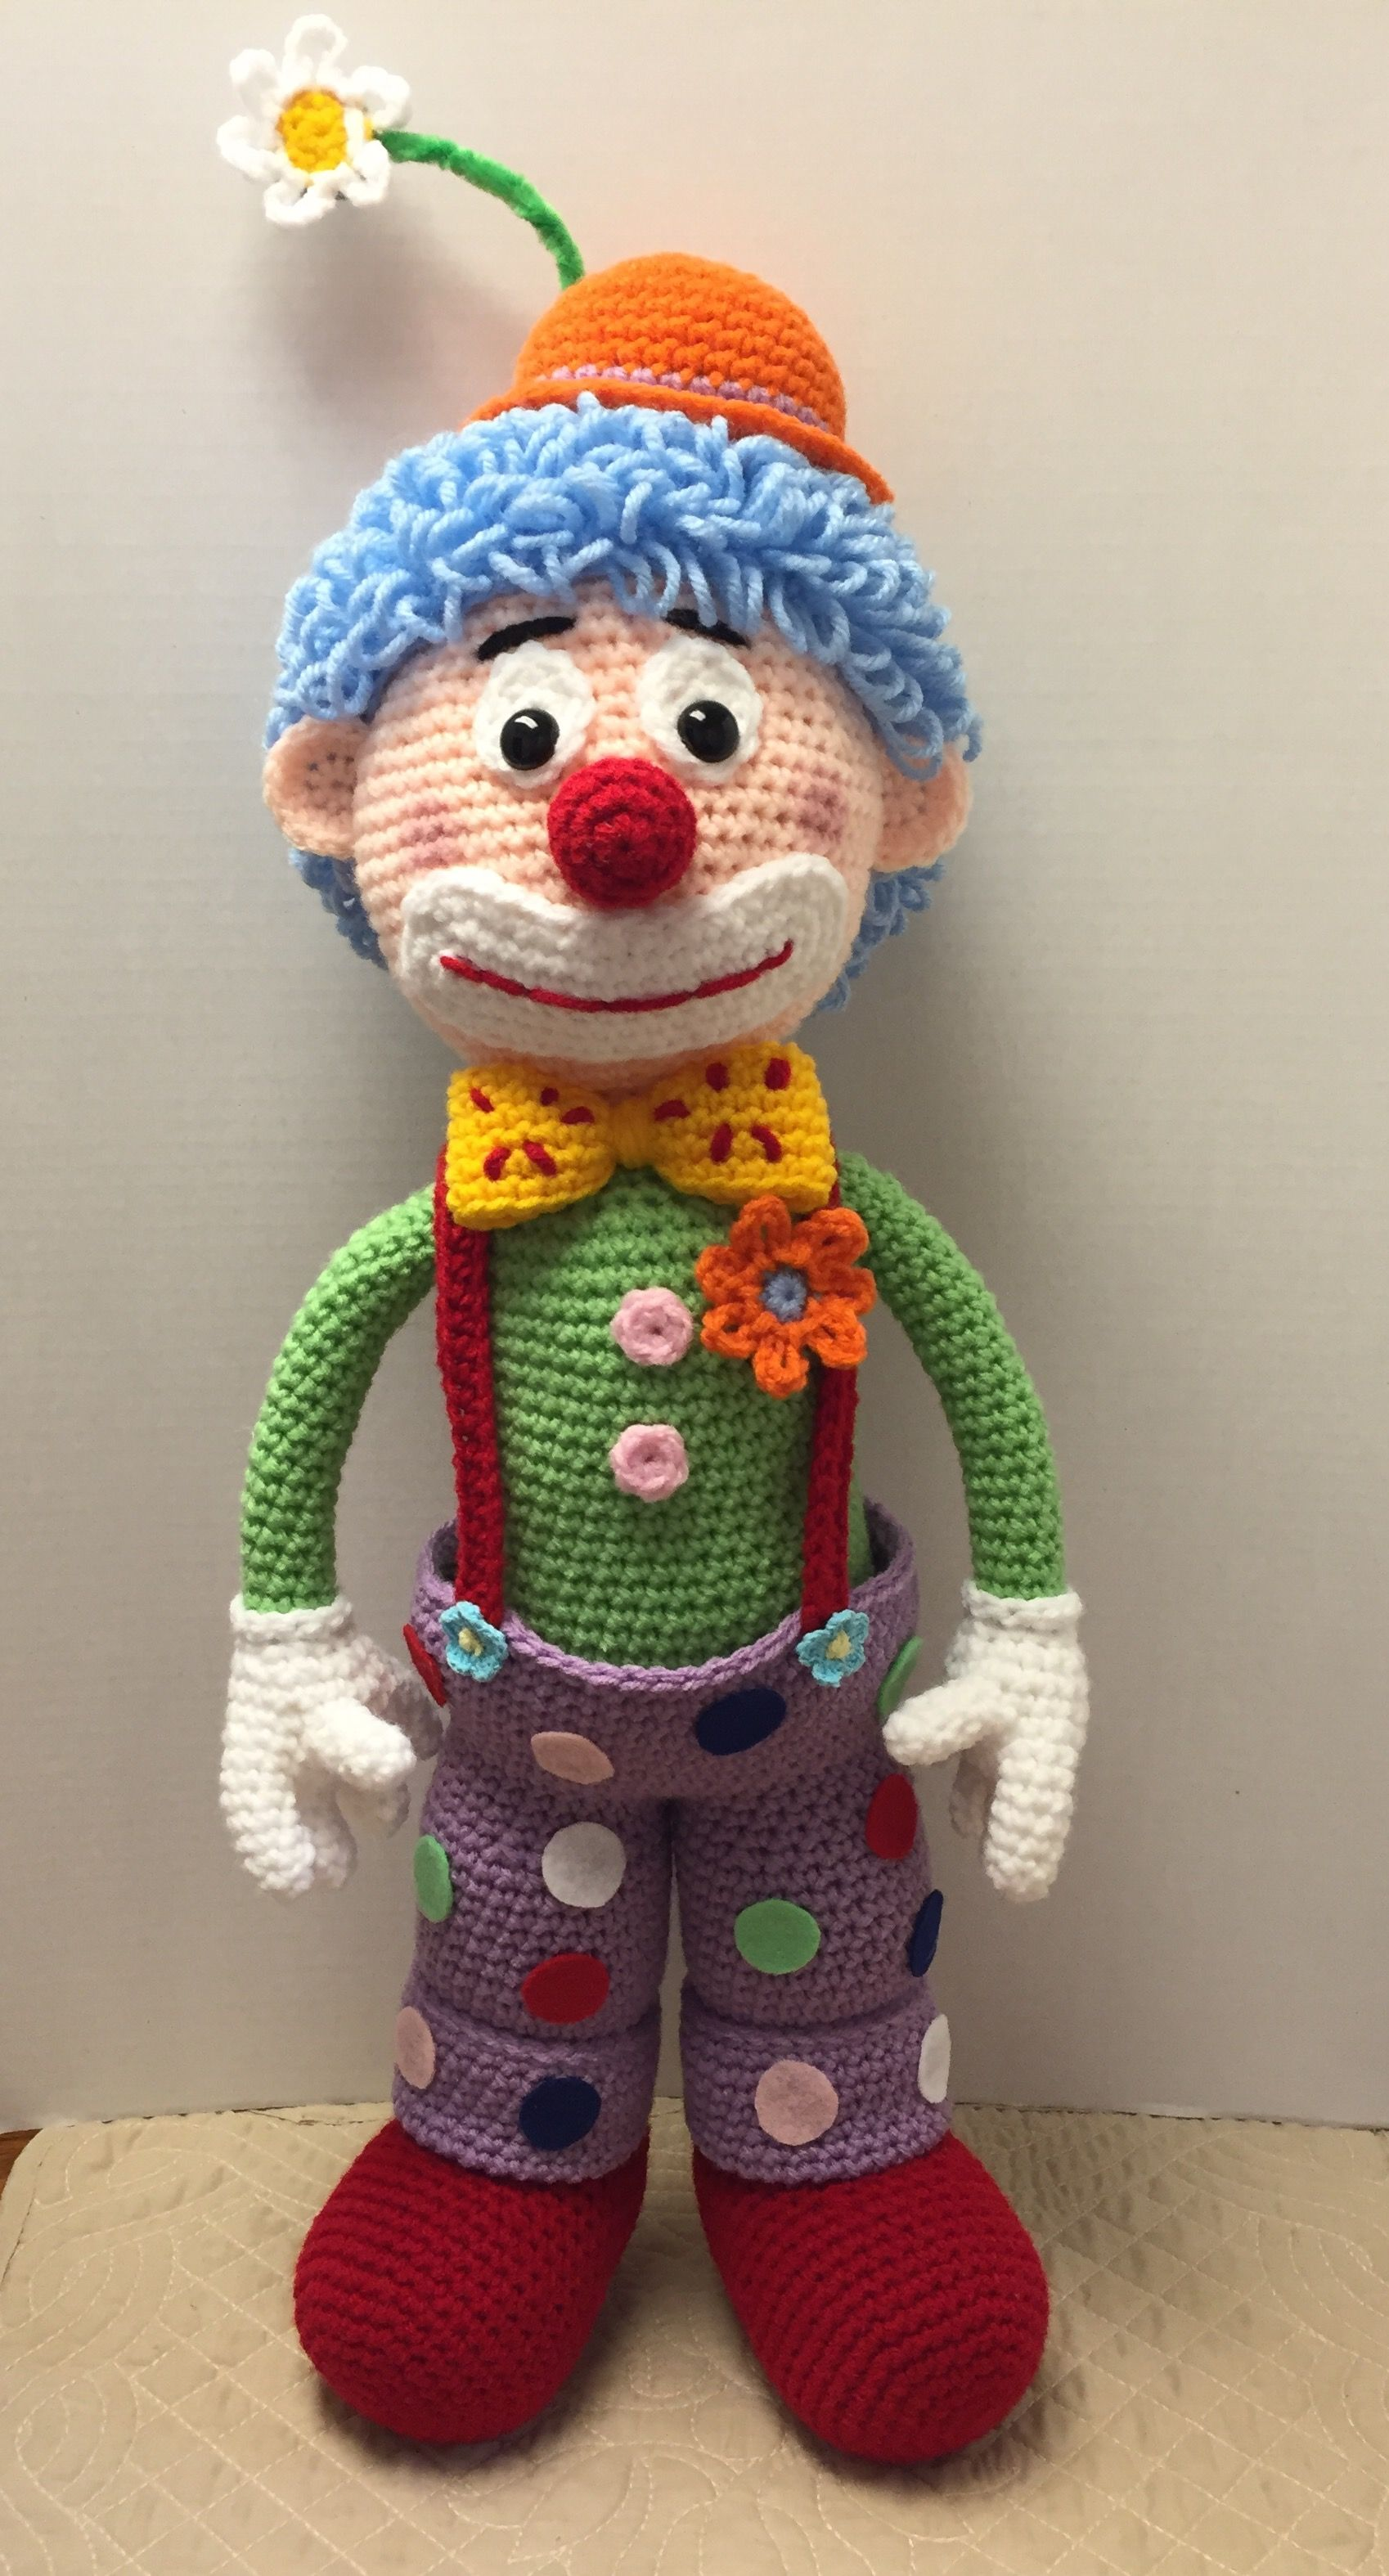 Arlo the clown | АРЛЕКИН И КЛОУН | Pinterest | Amigurumi, Crochet ...